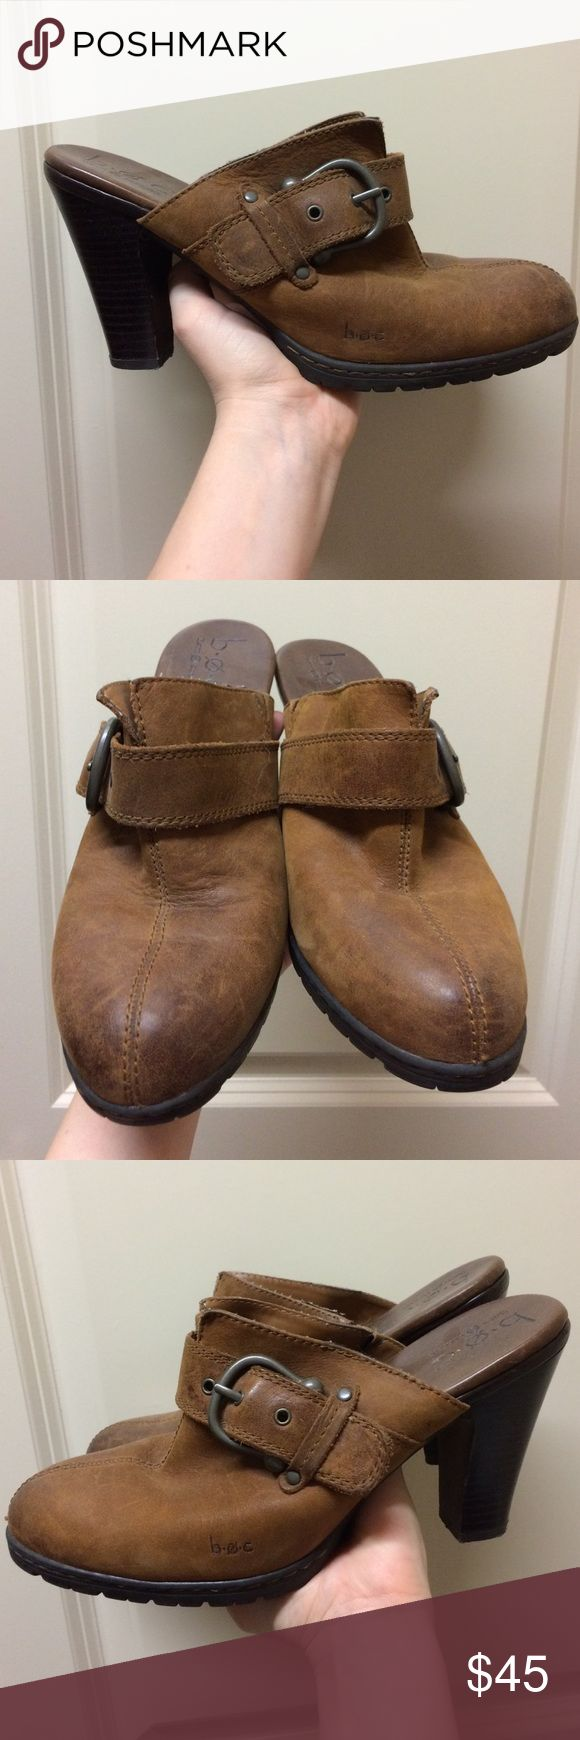 BOC 40.5 Brown Leather Mule Clog Heels BOC 40.5 Brown Leather Mule Clog Heels. Barely worn. About a size 9. b.o.c. Shoes Mules & Clogs